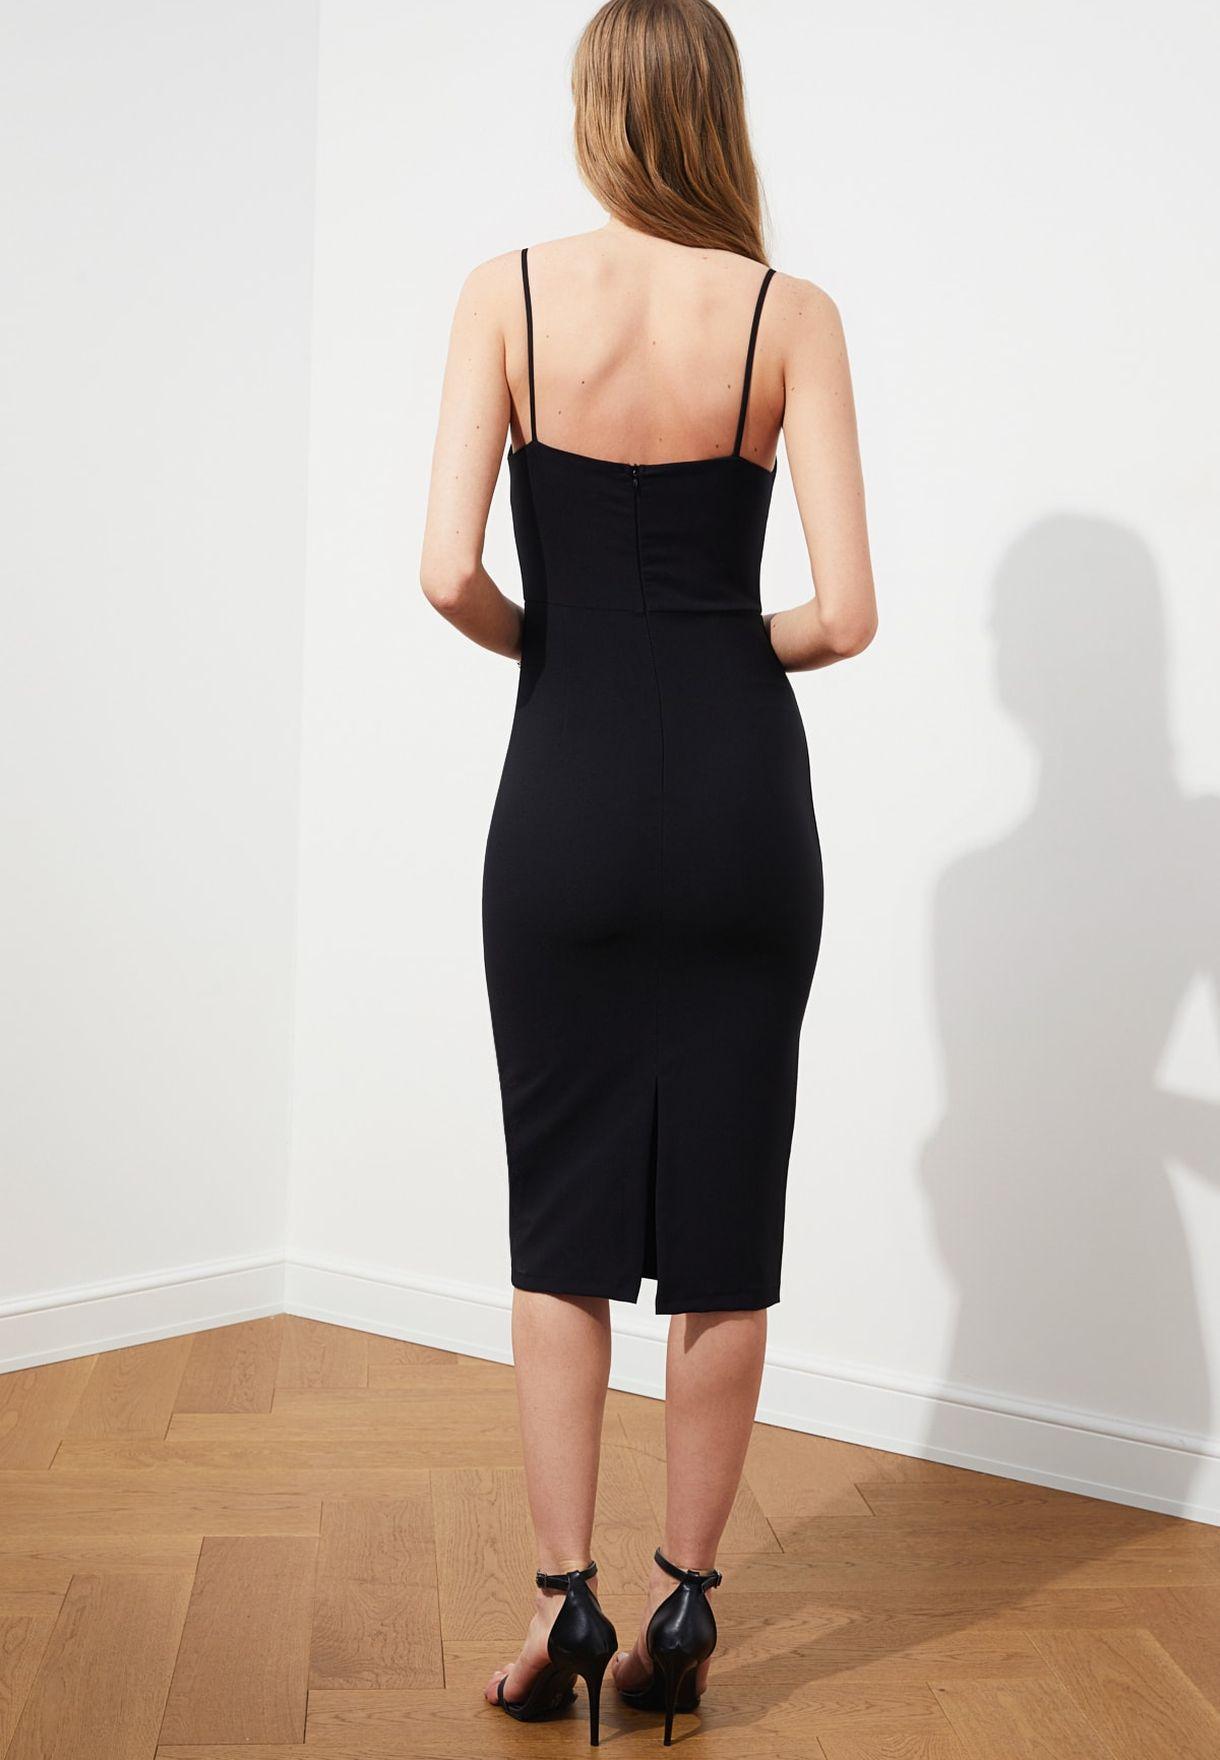 Square Neck Cami Strap Dress